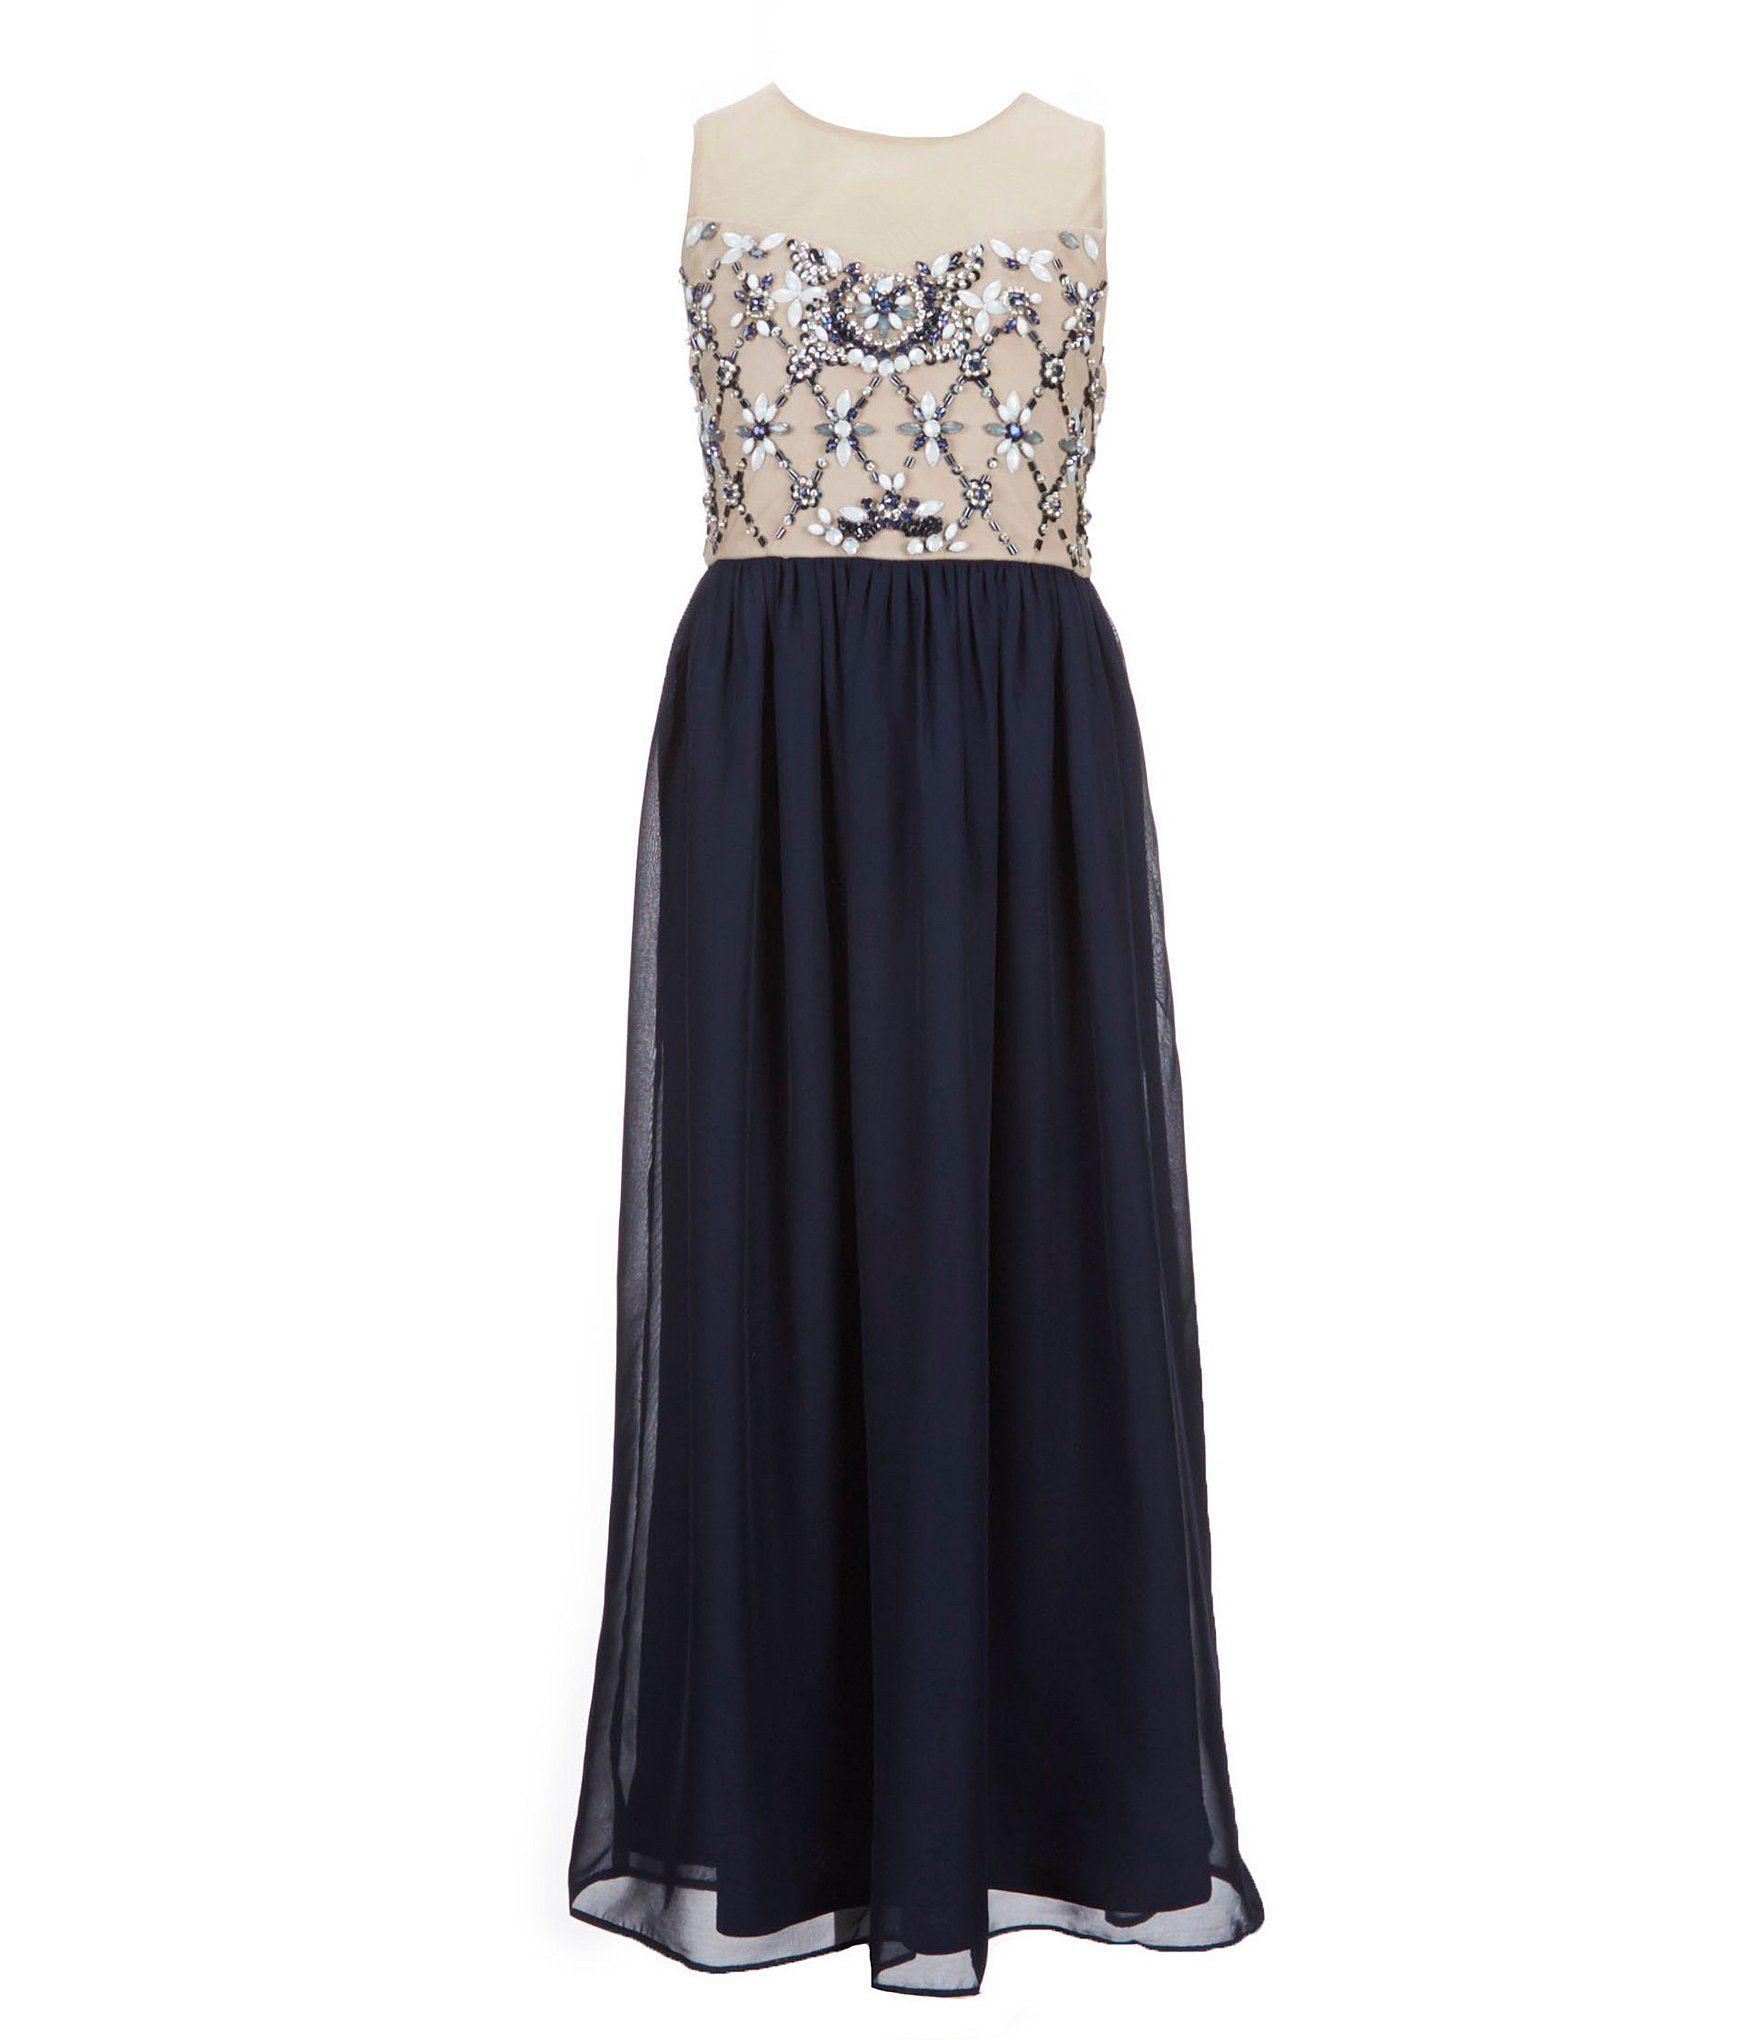 178c6a180f6 Tween Diva Big Girls 7-16 Rhinestone Chiffon Dress